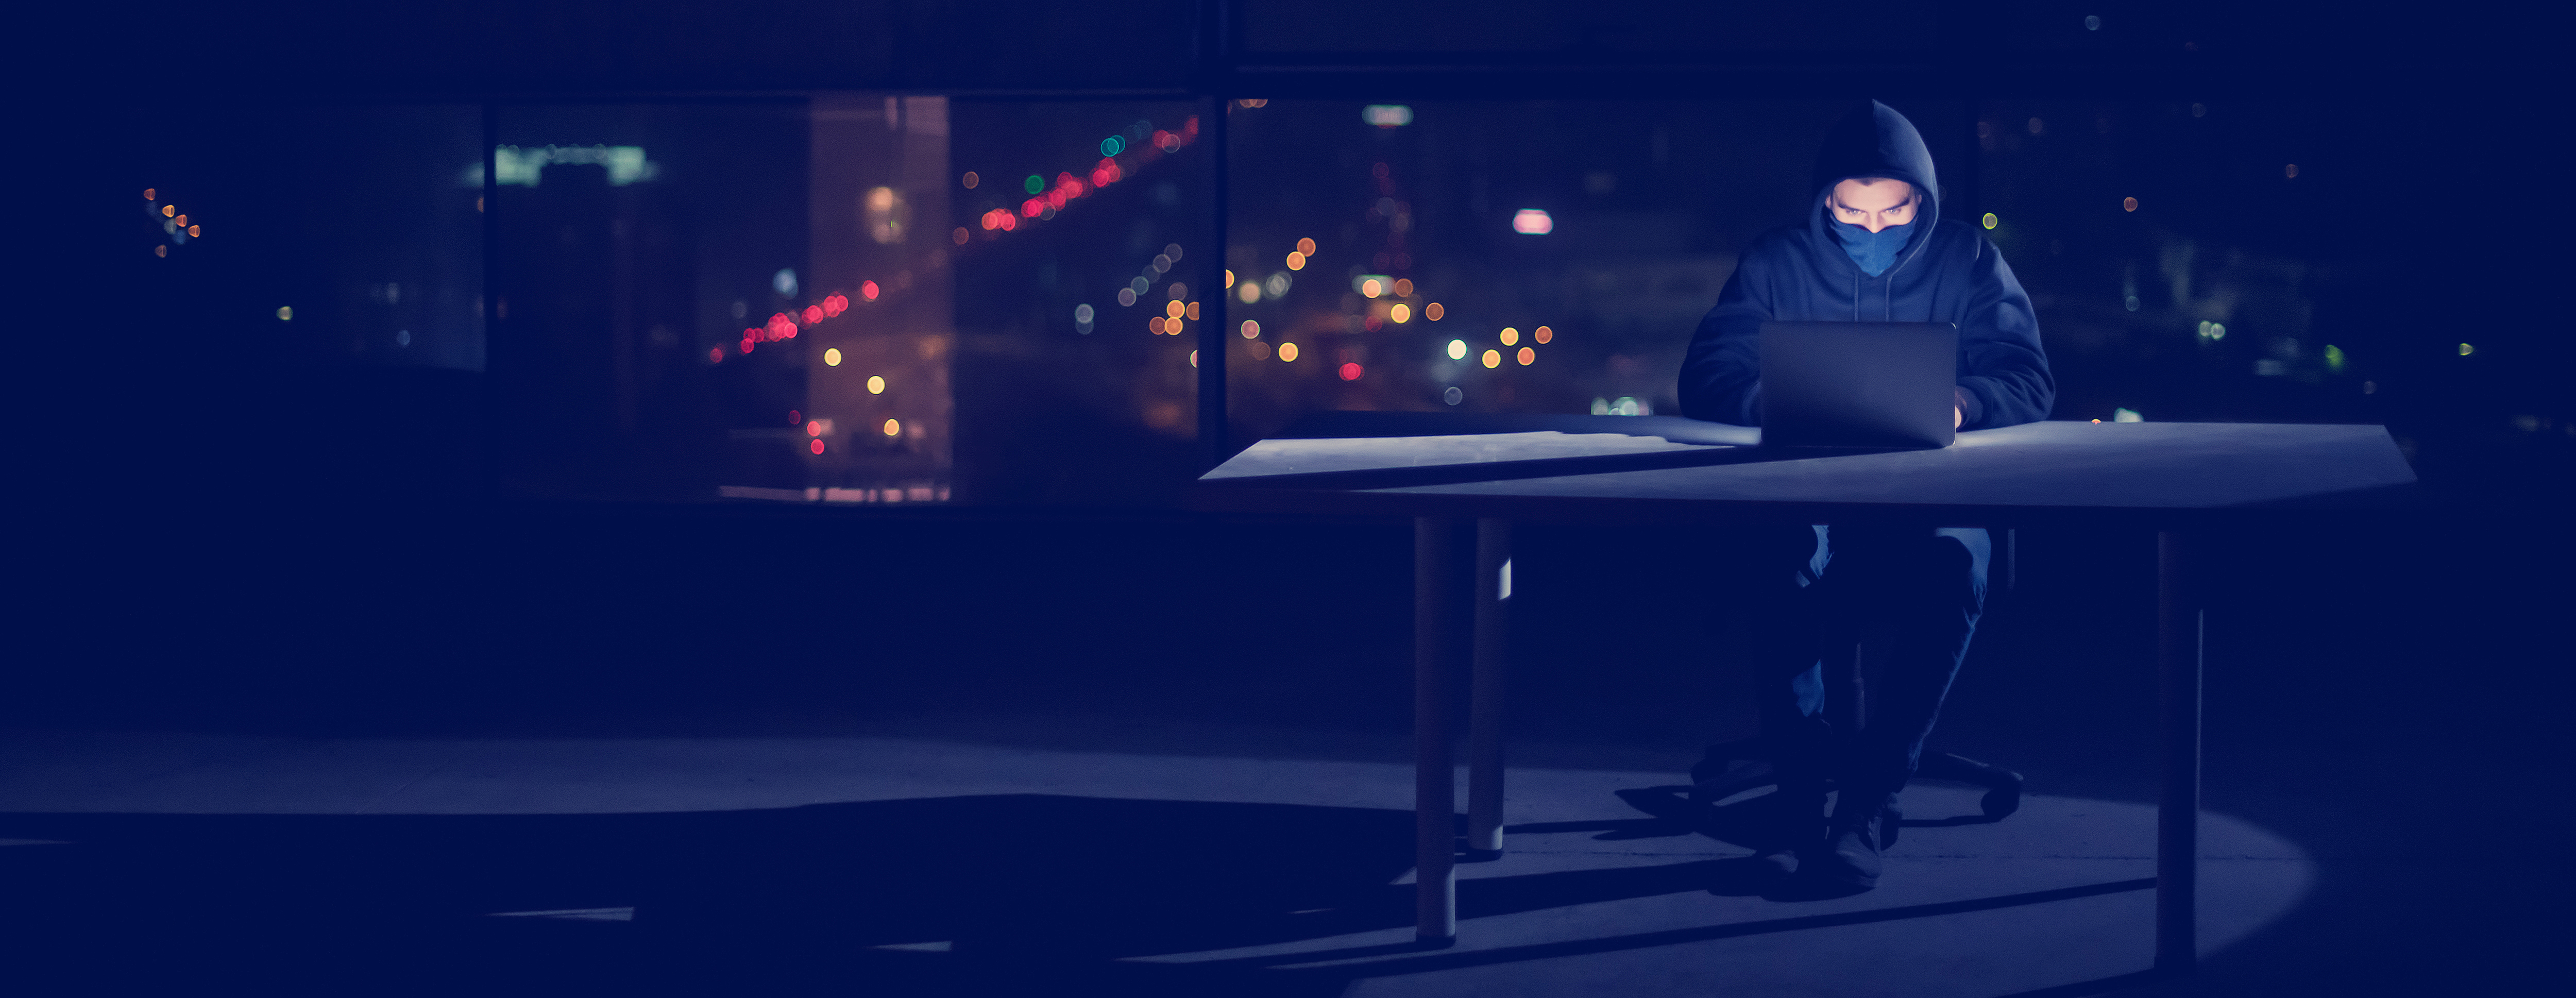 hacker in the city cybersecurity